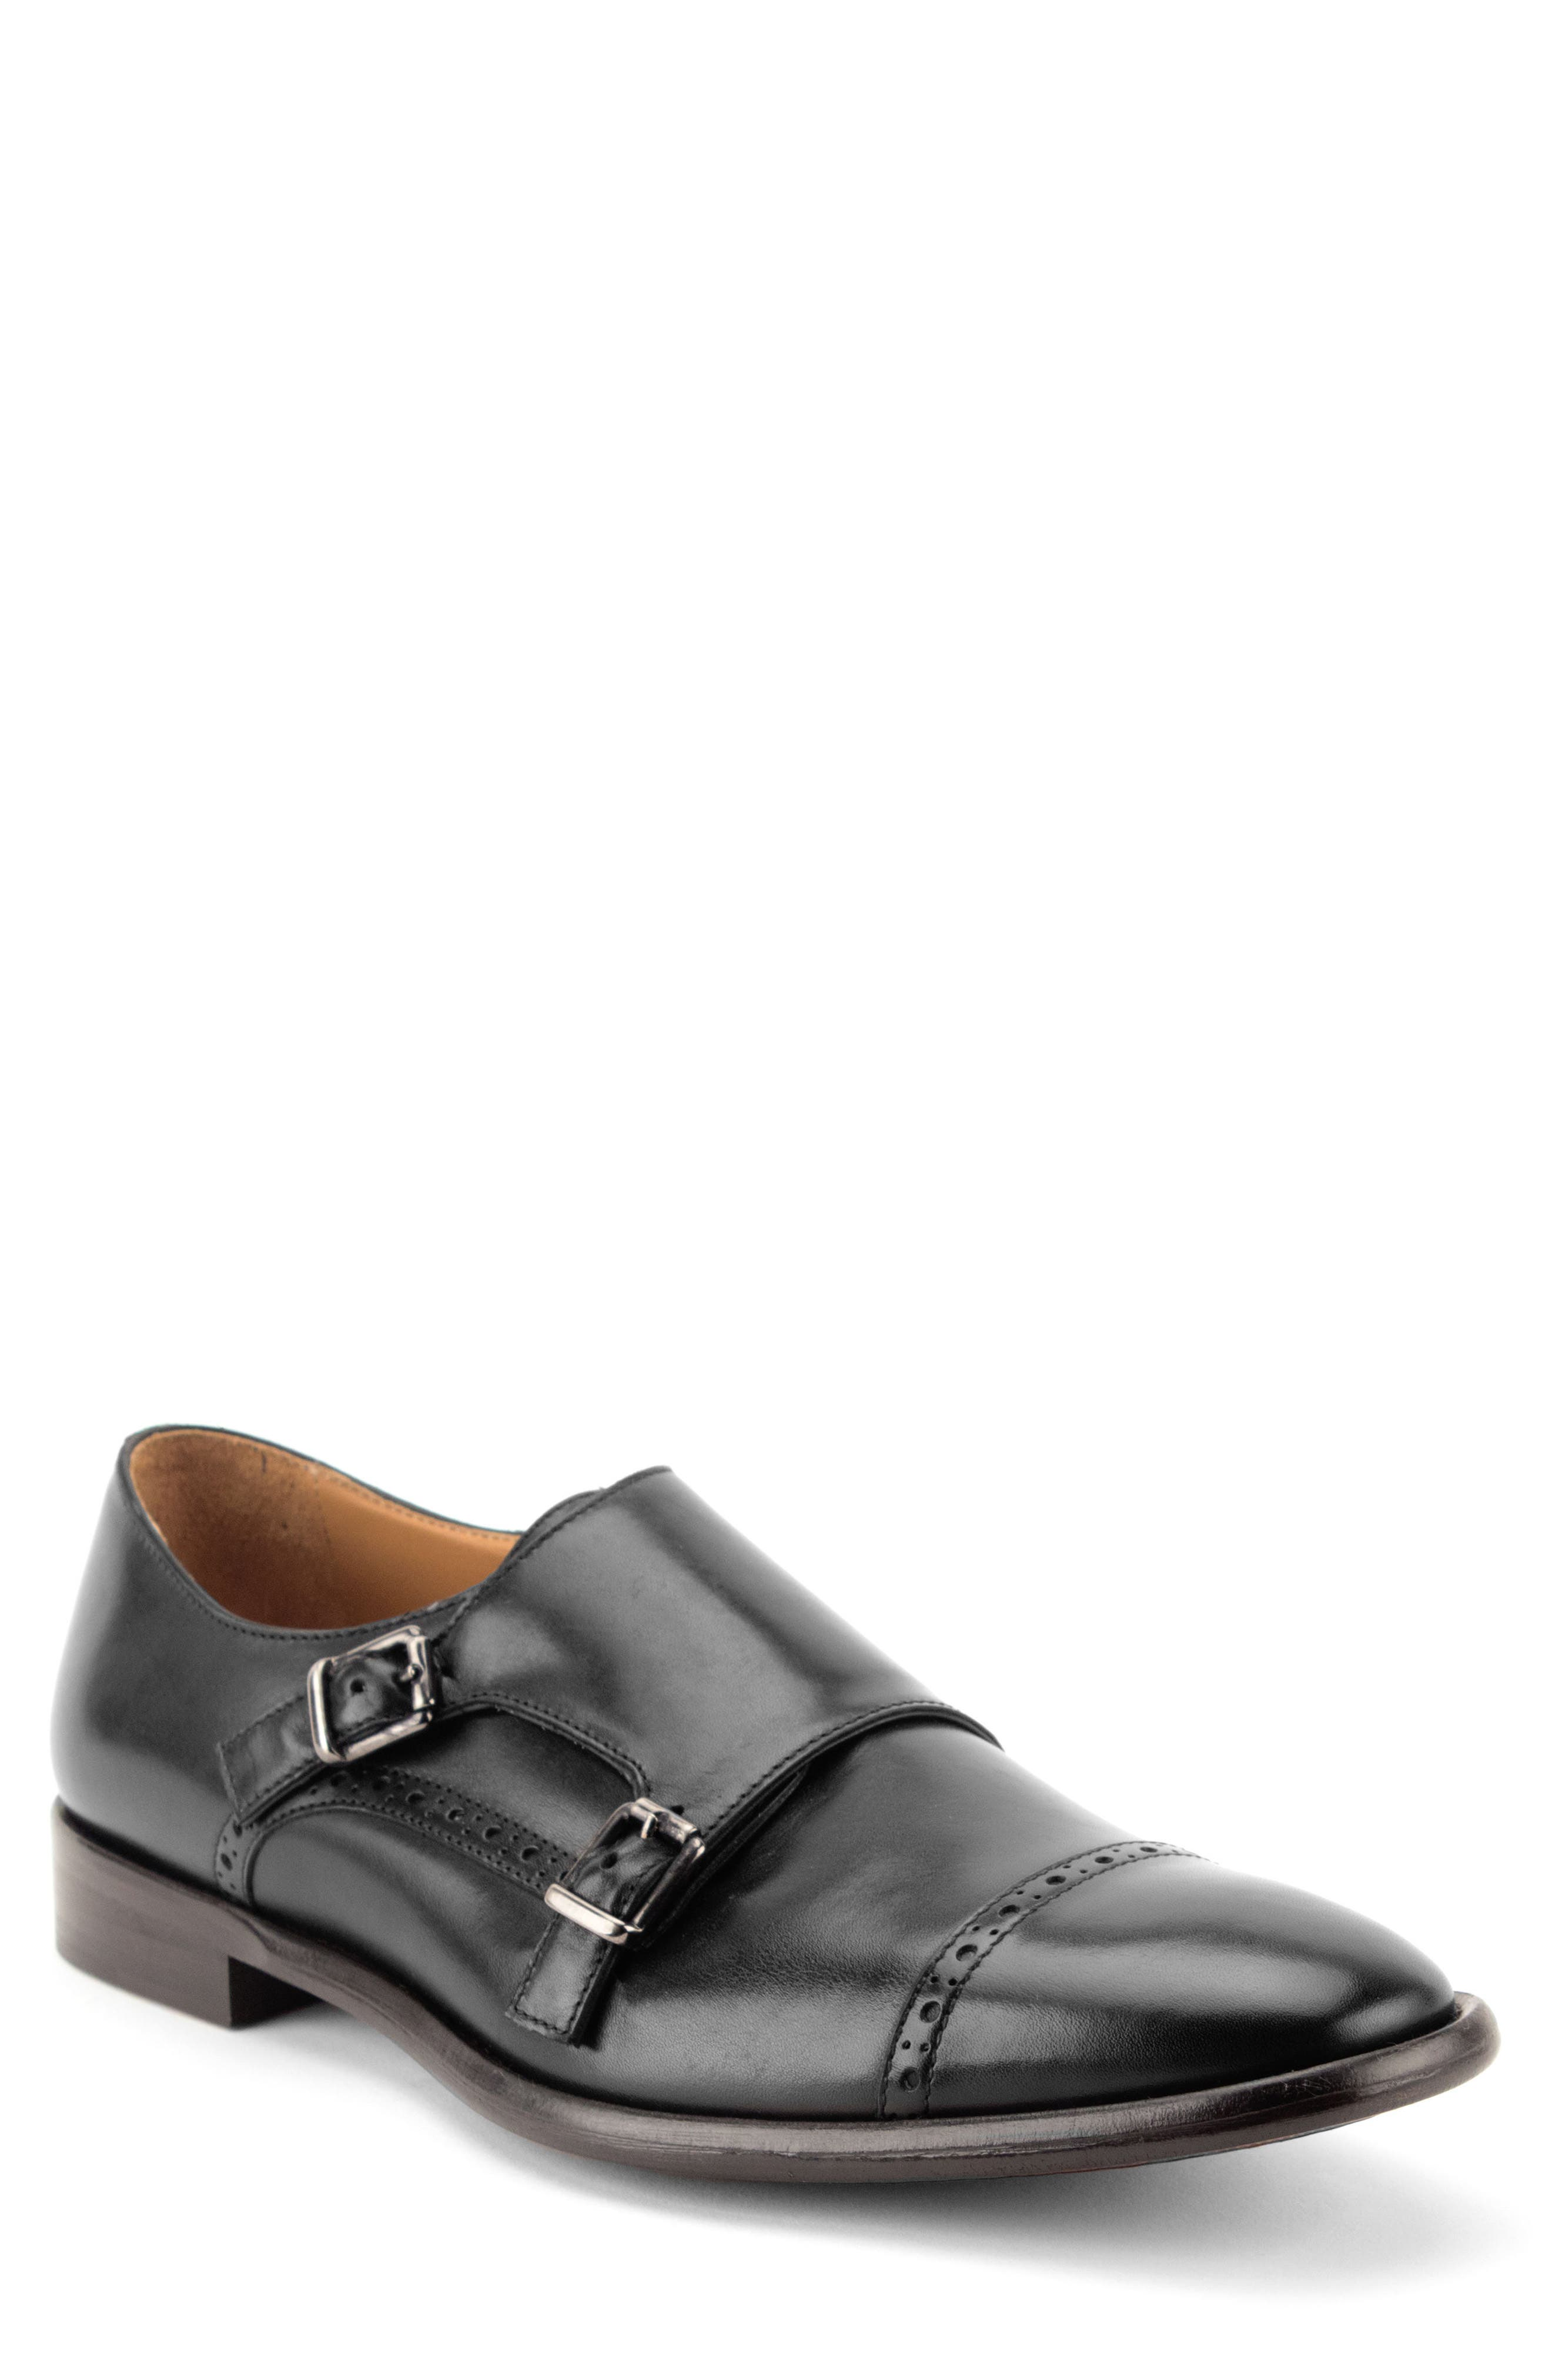 Corbett Cap Toe Double Strap Monk Shoe,                             Main thumbnail 1, color,                             BLACK LEATHER